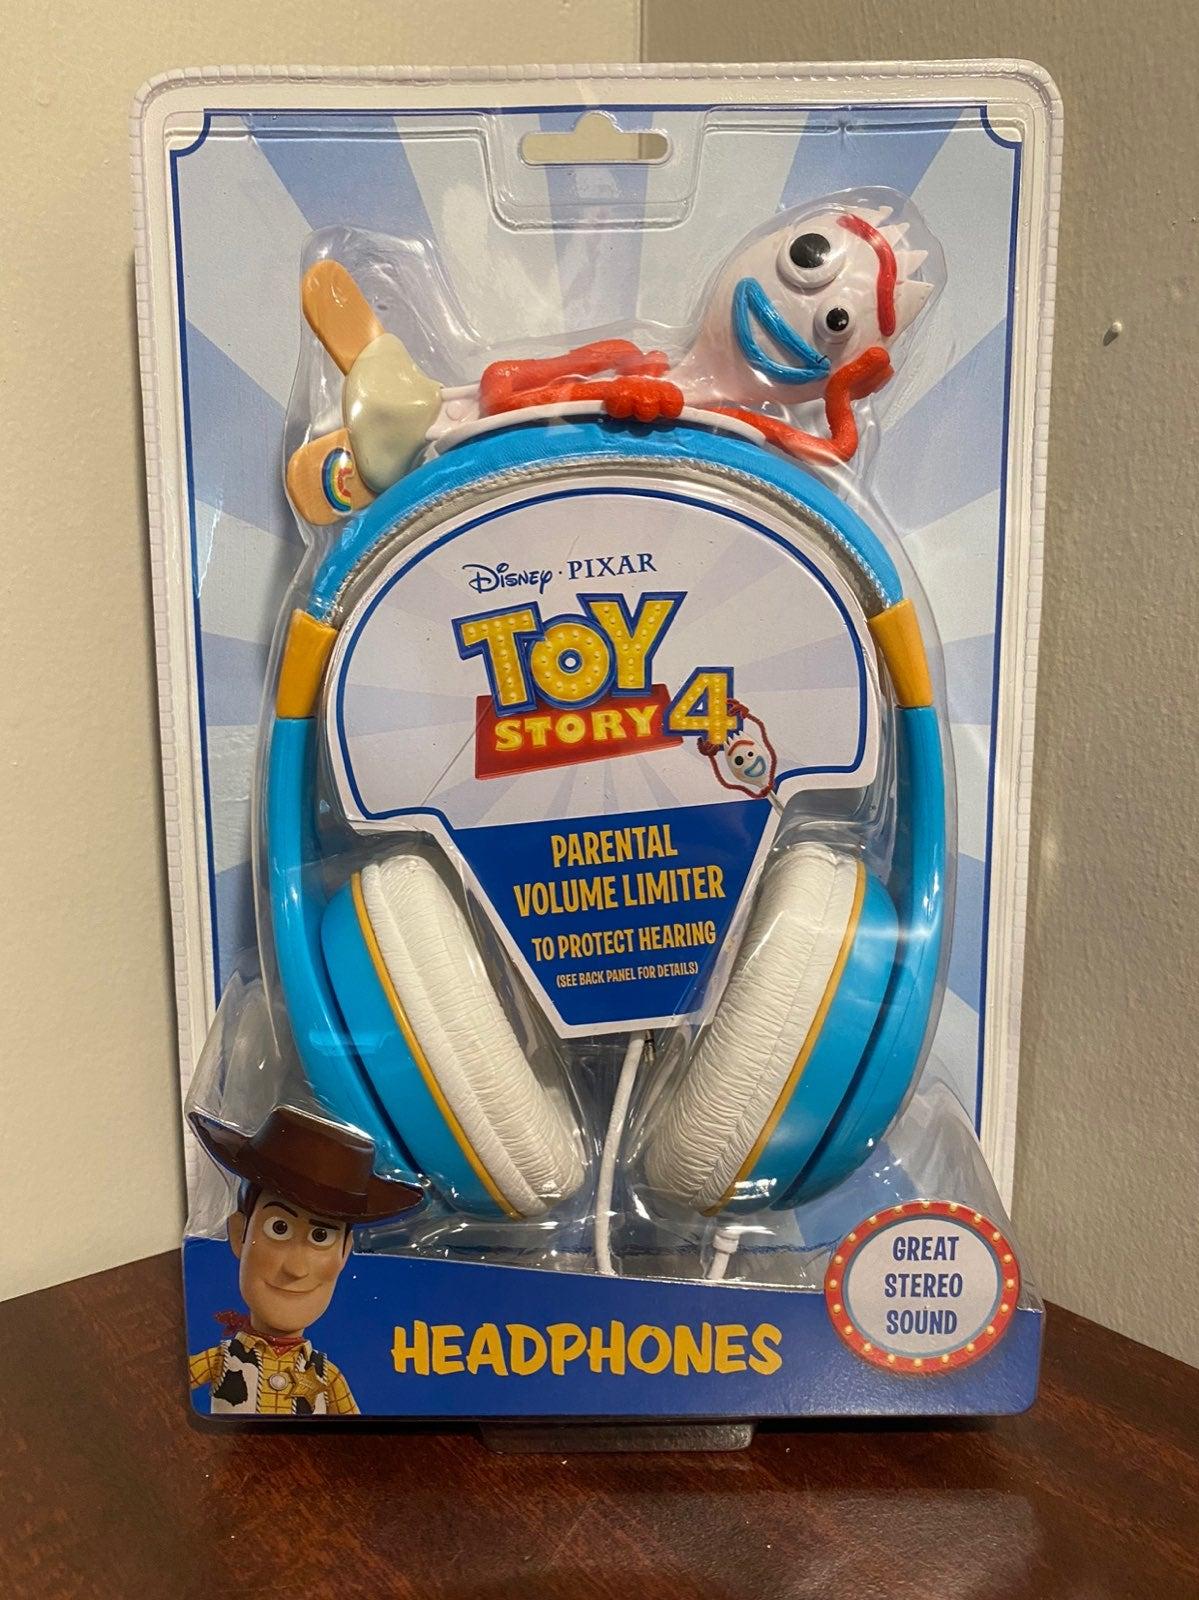 New toy story 4 kids headphones